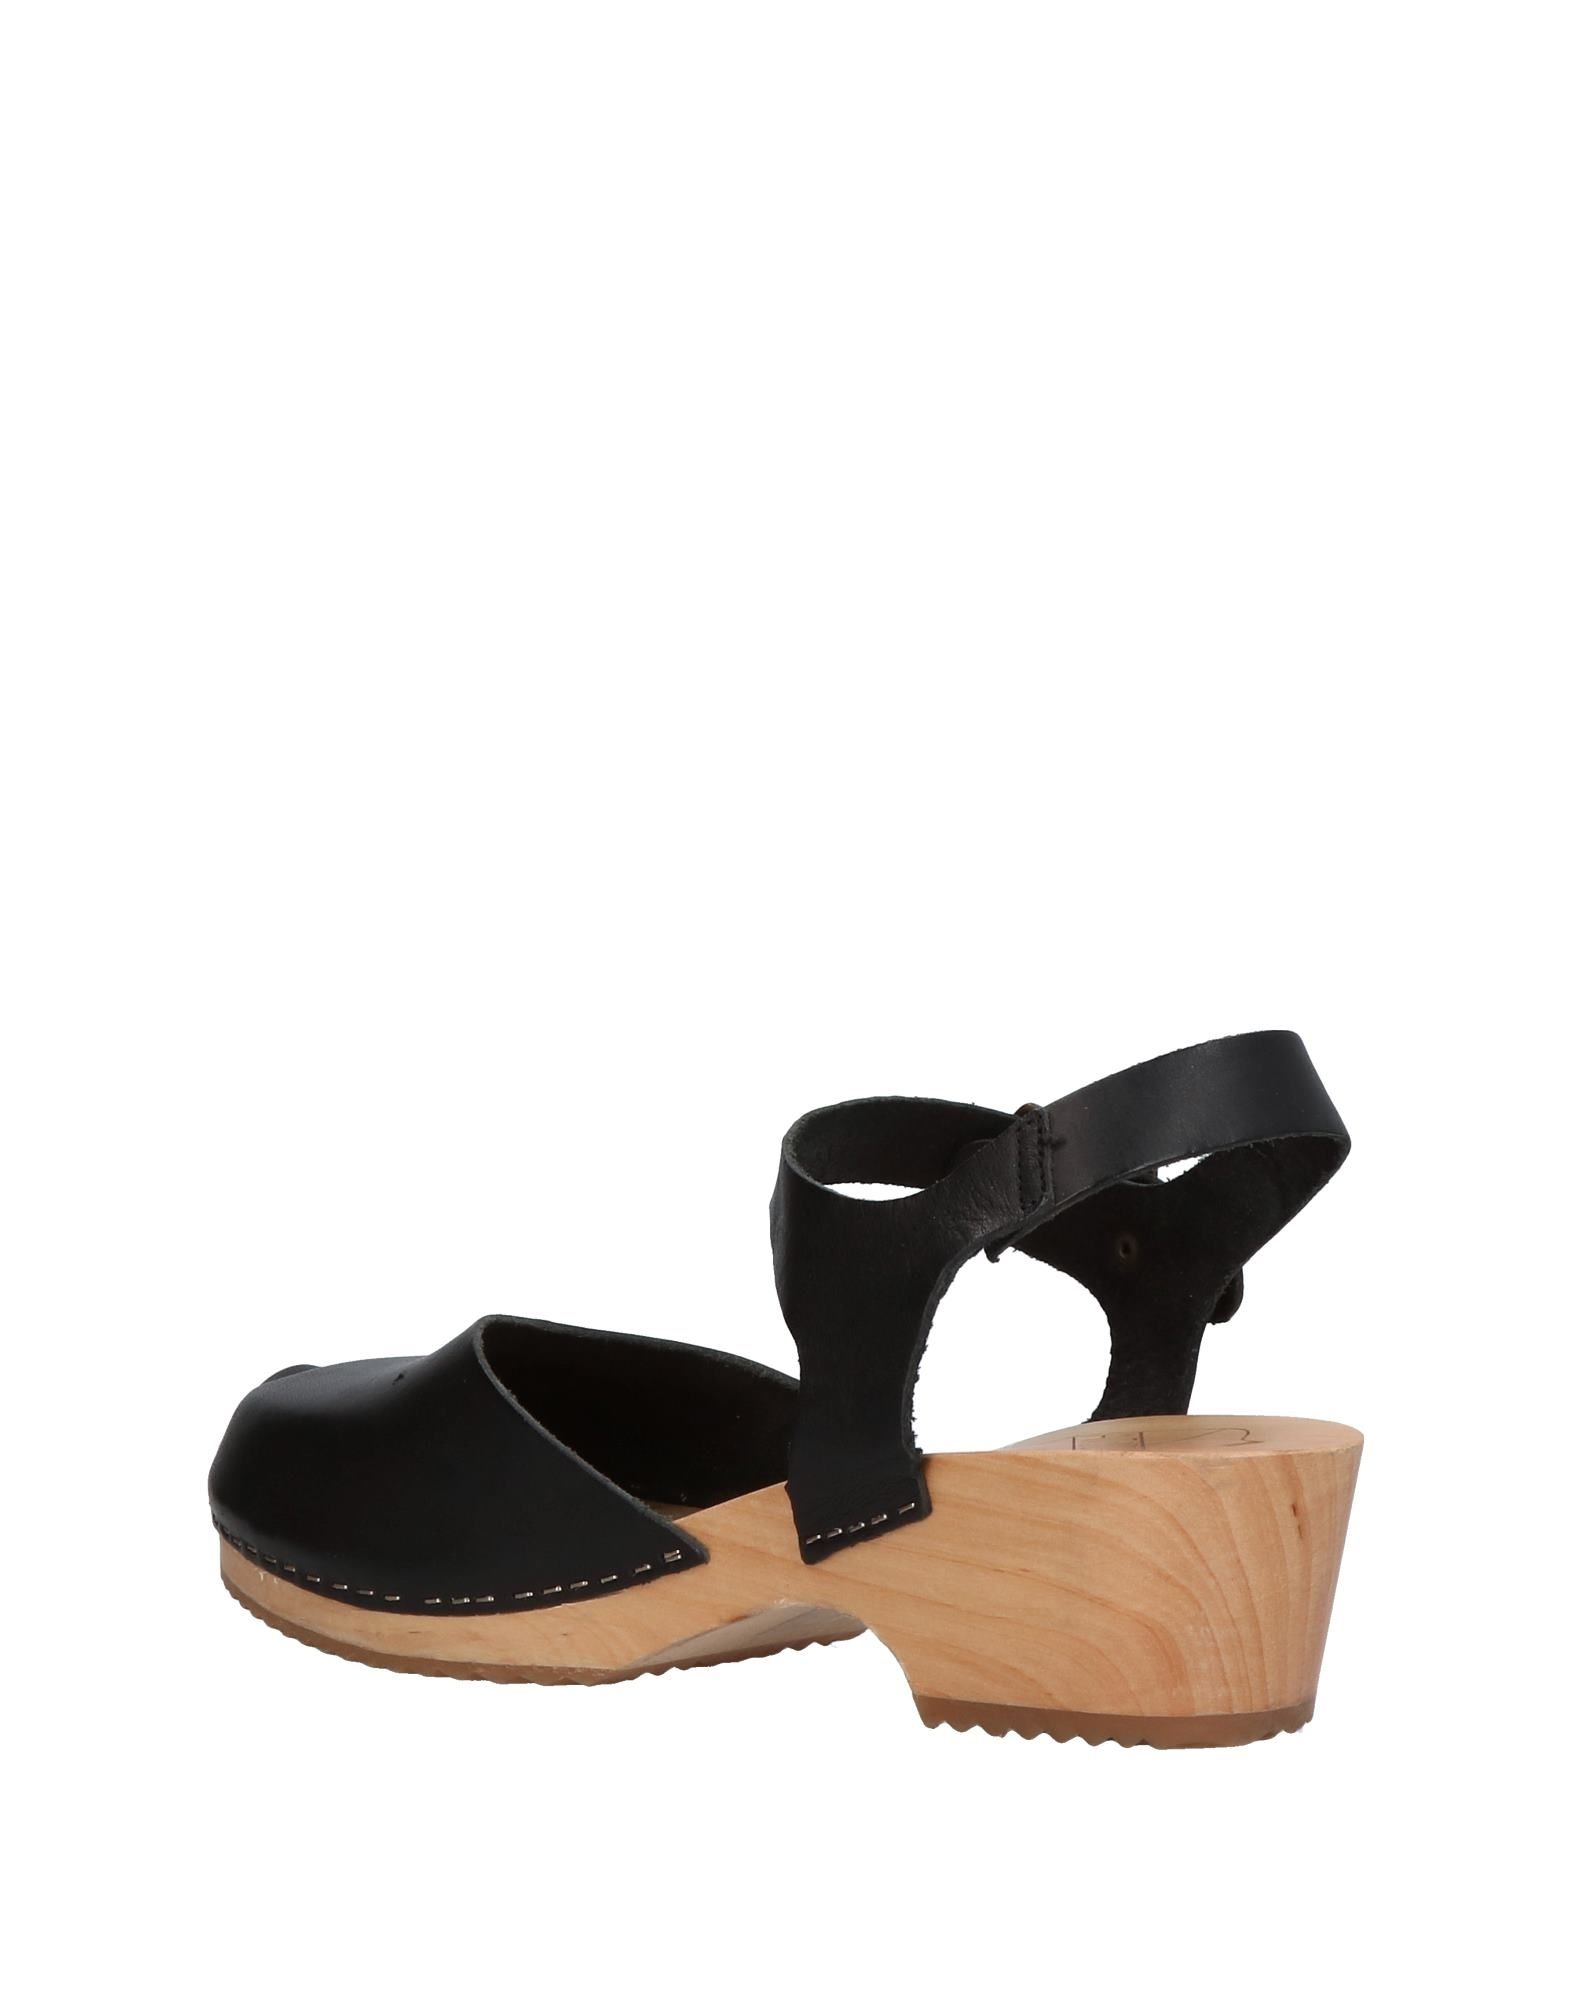 Antidoti Pumps Damen  11358546HK Gute Qualität beliebte beliebte Qualität Schuhe 3d2762